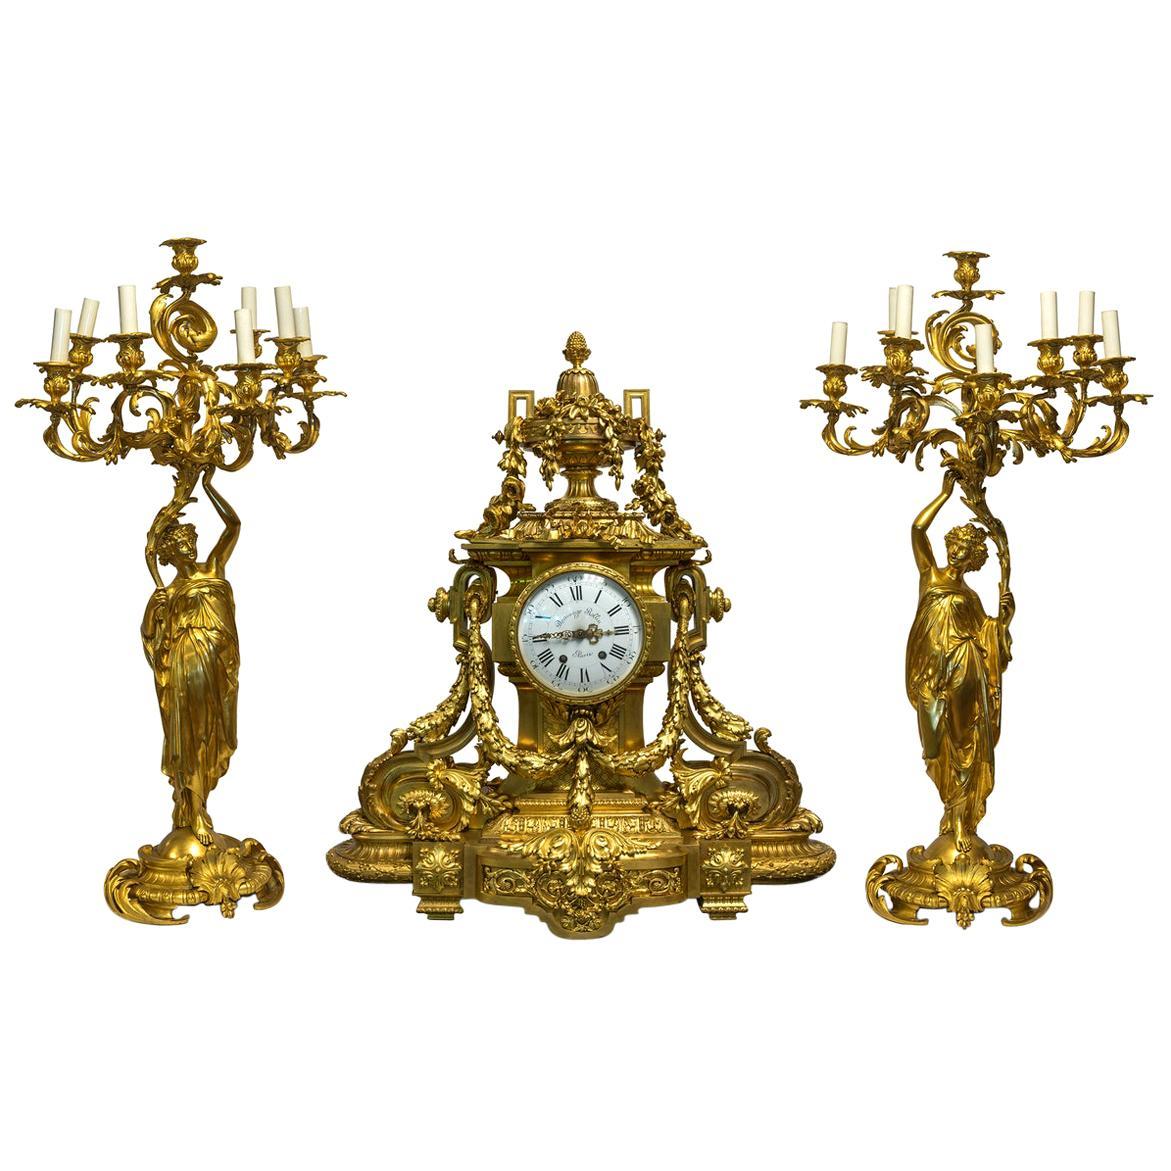 Monumental 19th Century French Three-Piece Ormolu Clock Garniture